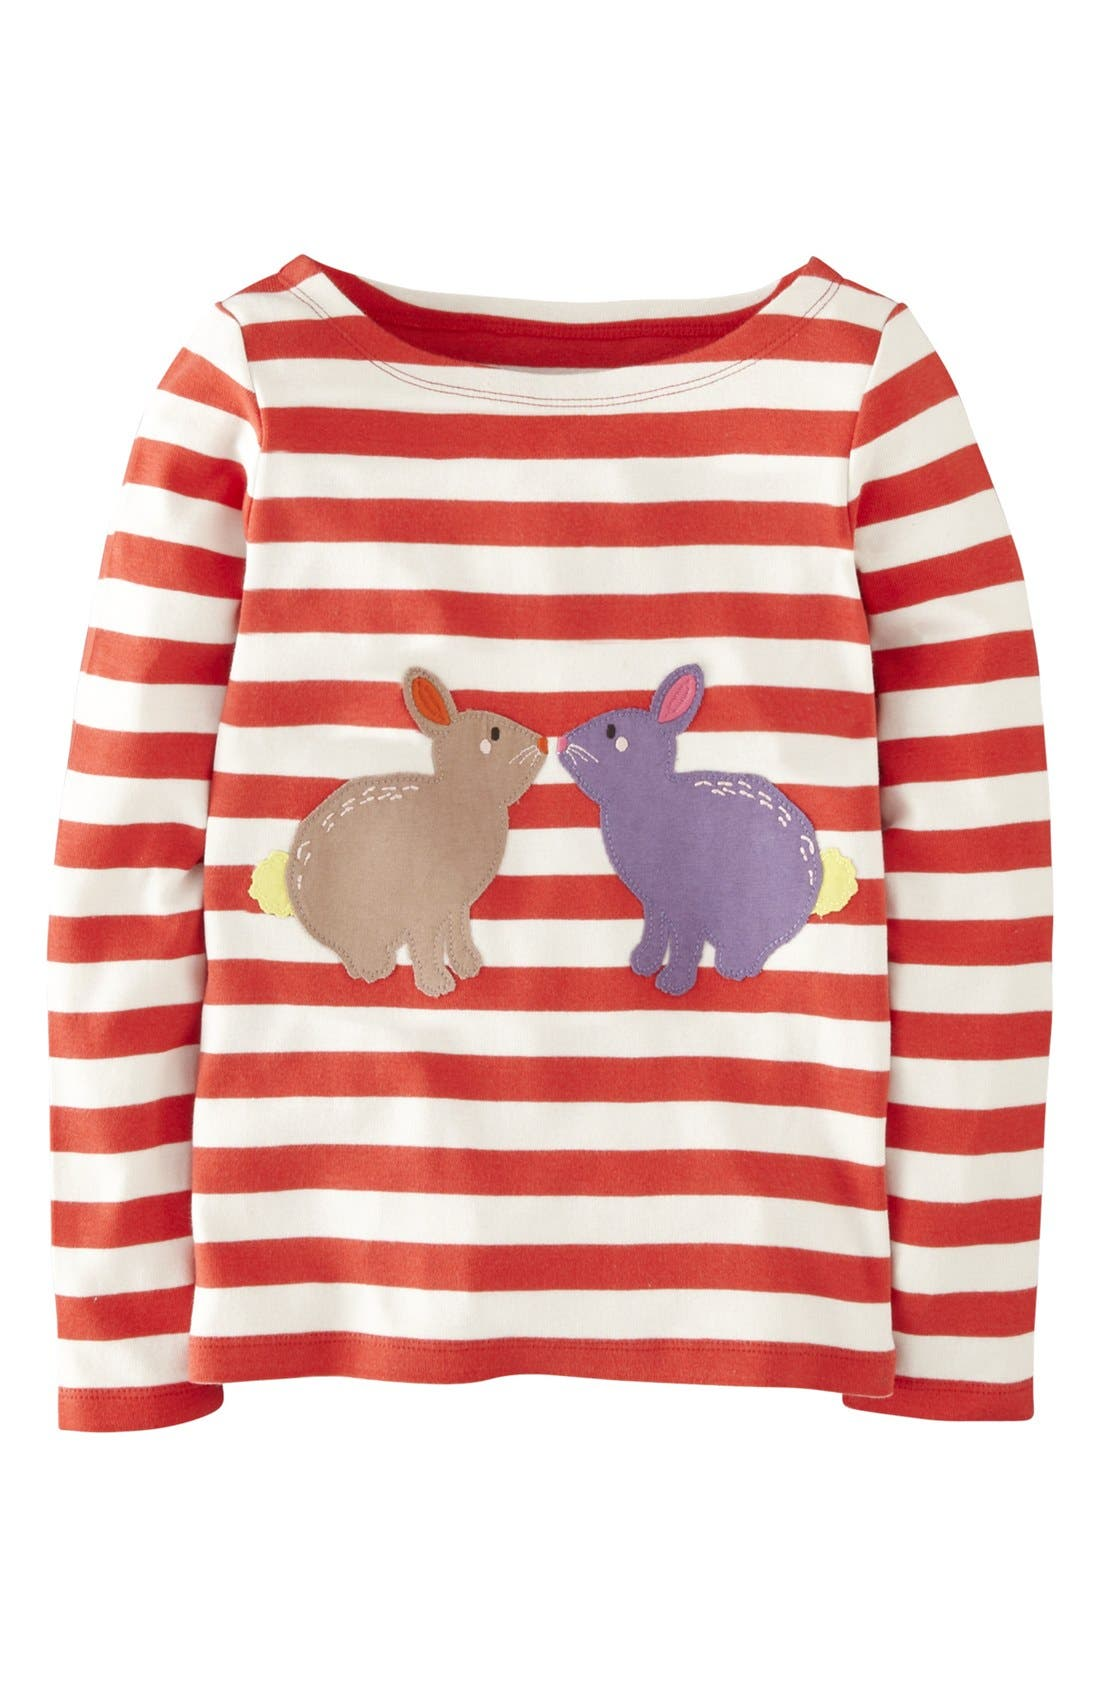 Alternate Image 1 Selected - Mini Boden 'Stripy Animal' Tee (Toddler Girls)